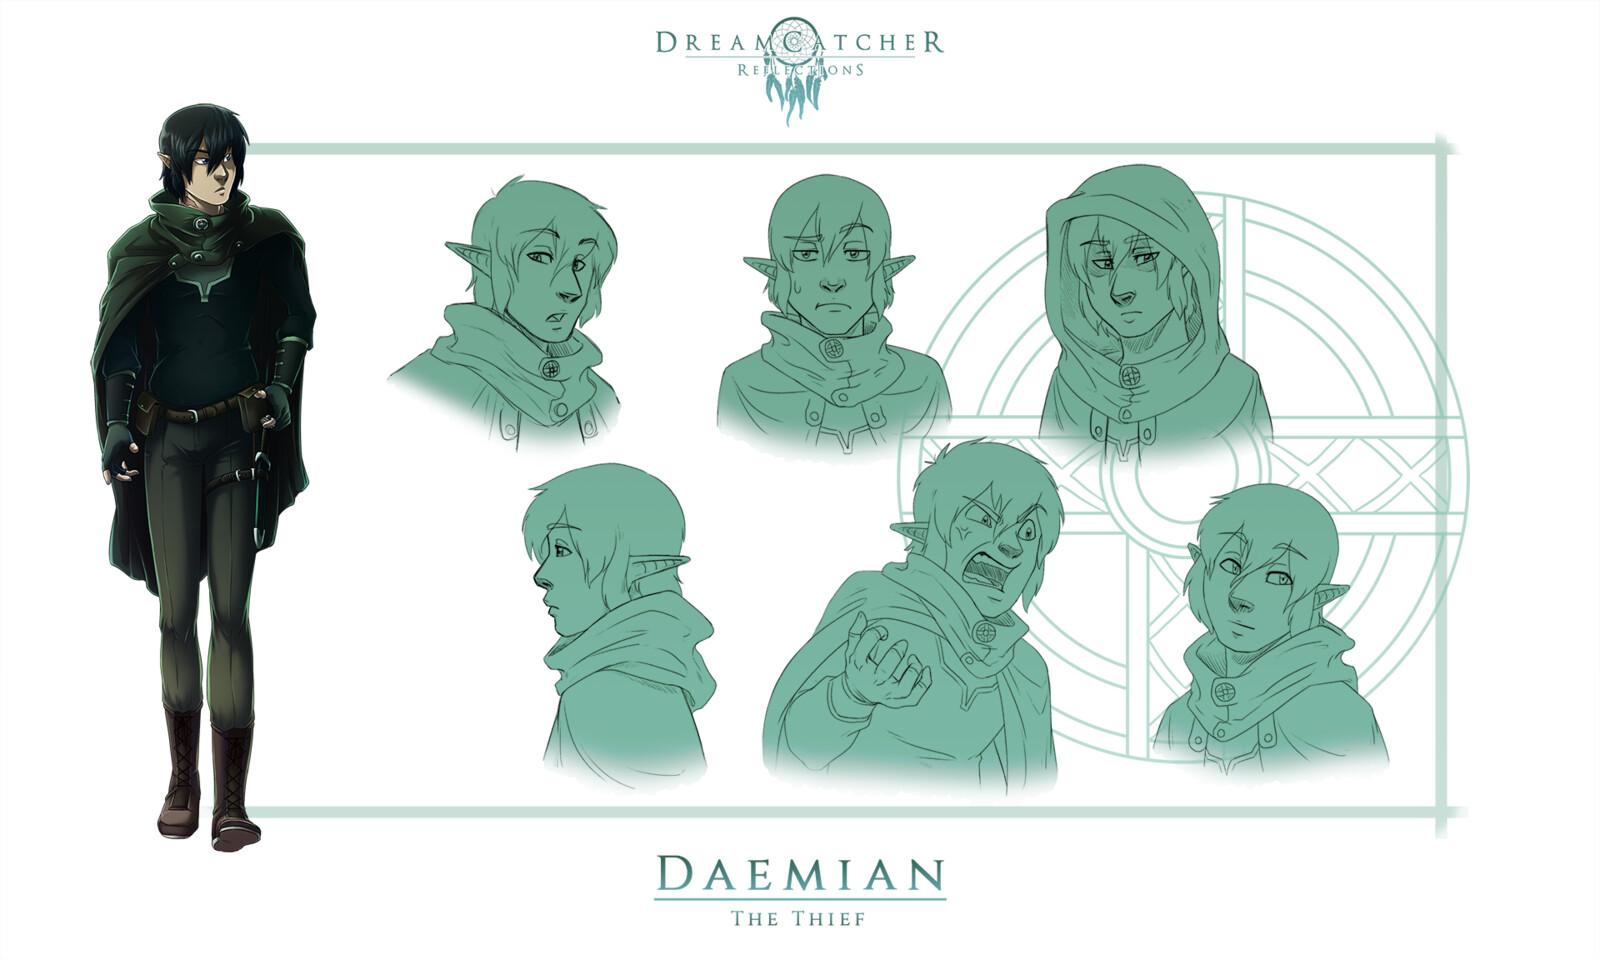 DreamCatcher: Reflections - Daemian Ref